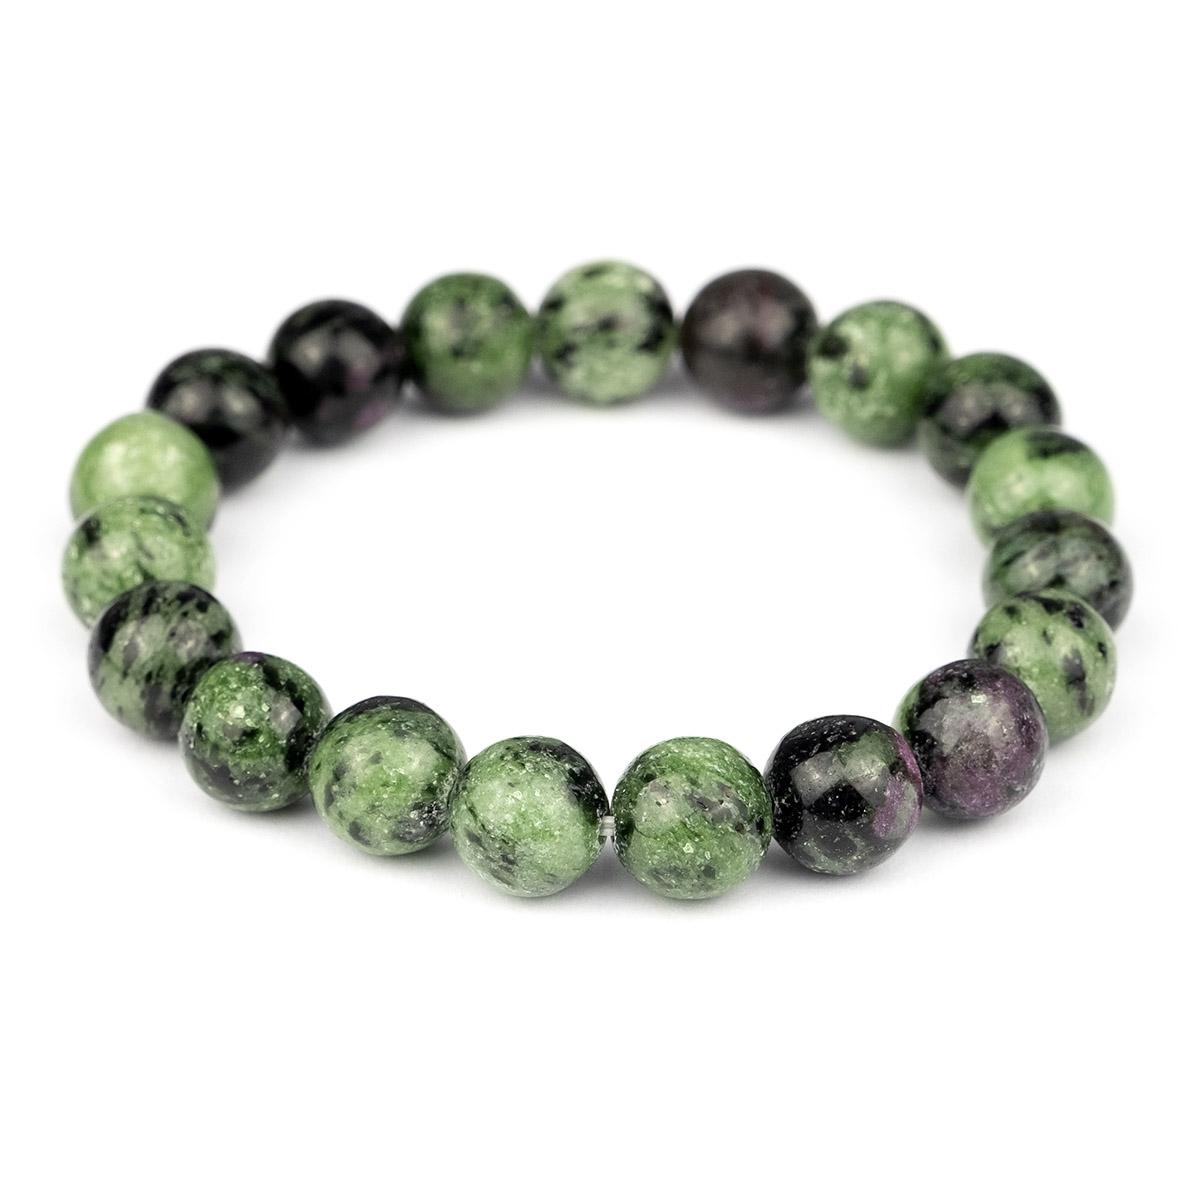 Bracelet extensible en perles de Rubis Zoïsite 10 mm